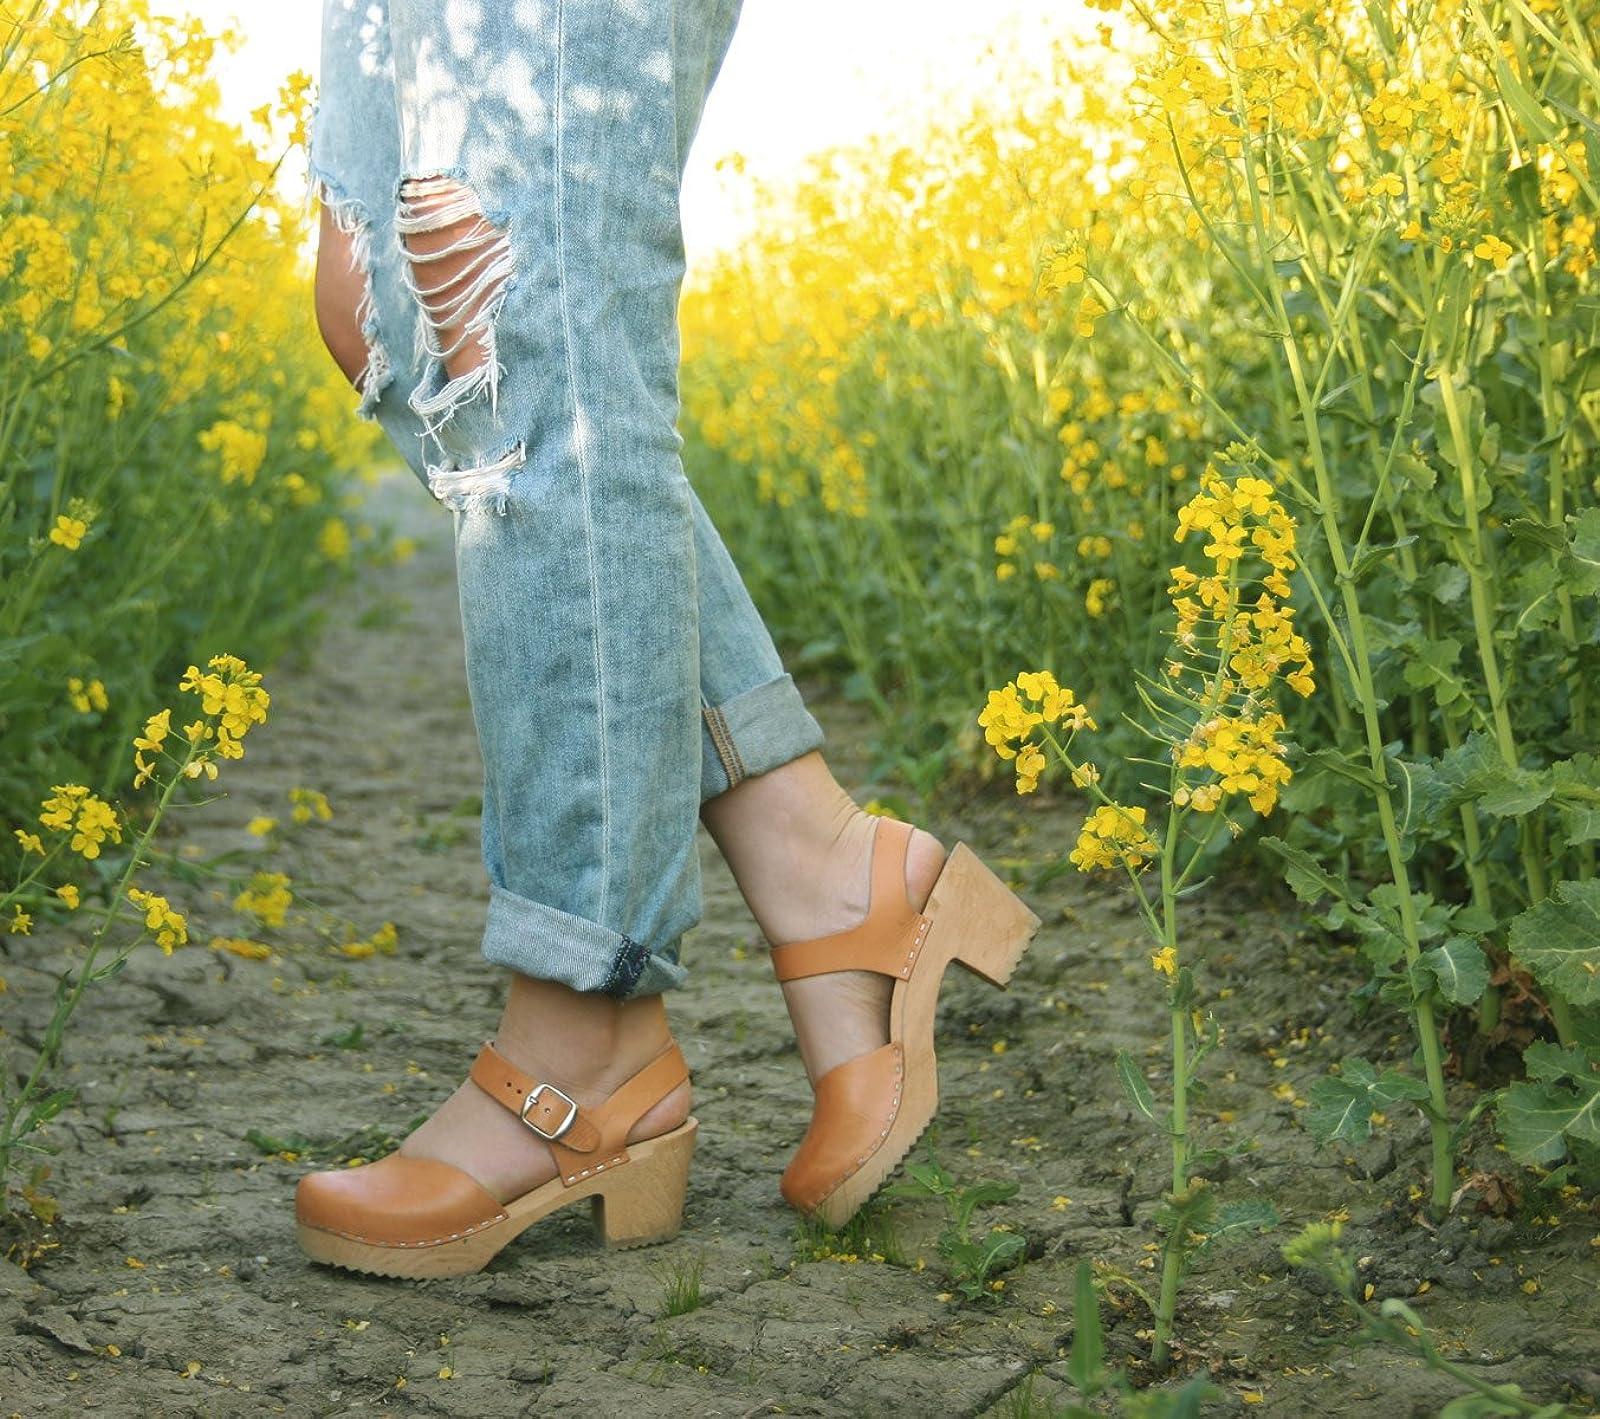 Sandgrens Swedish Wooden High Heel Clog Sandals - 6